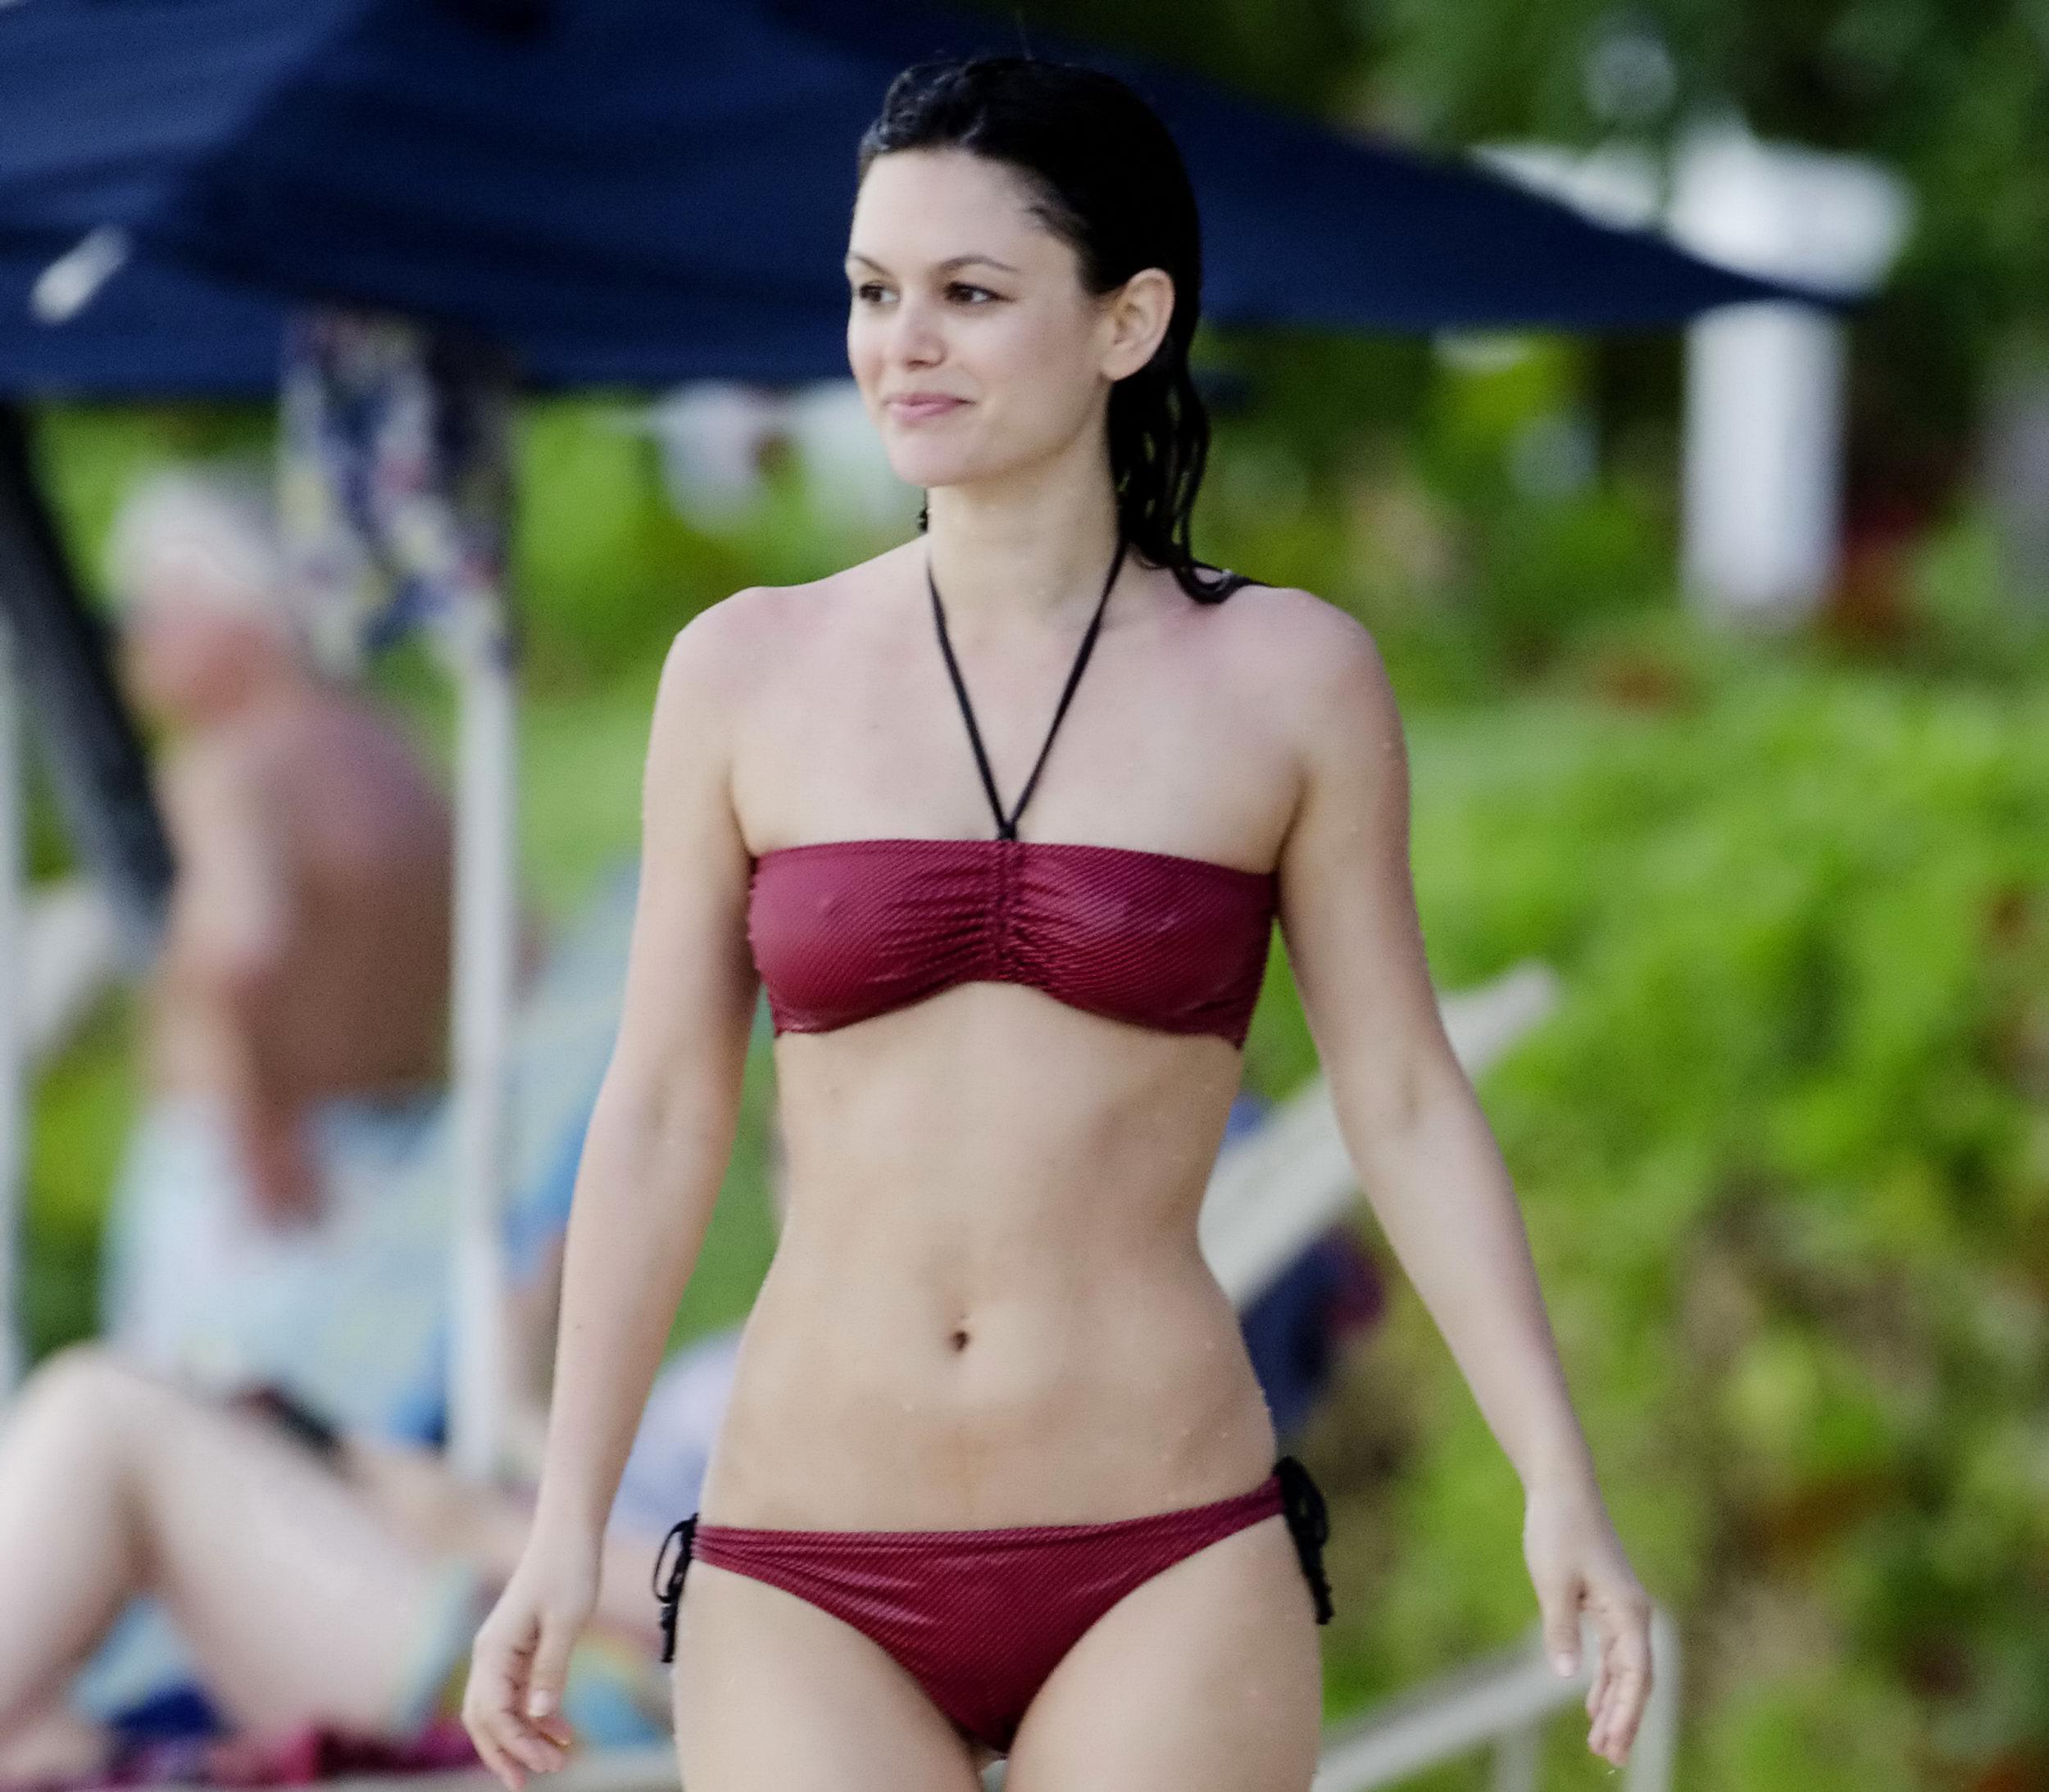 25361_RachelBilson_2011_04_23_bikinicandidsinBarbados_030_122_237lo.jpg